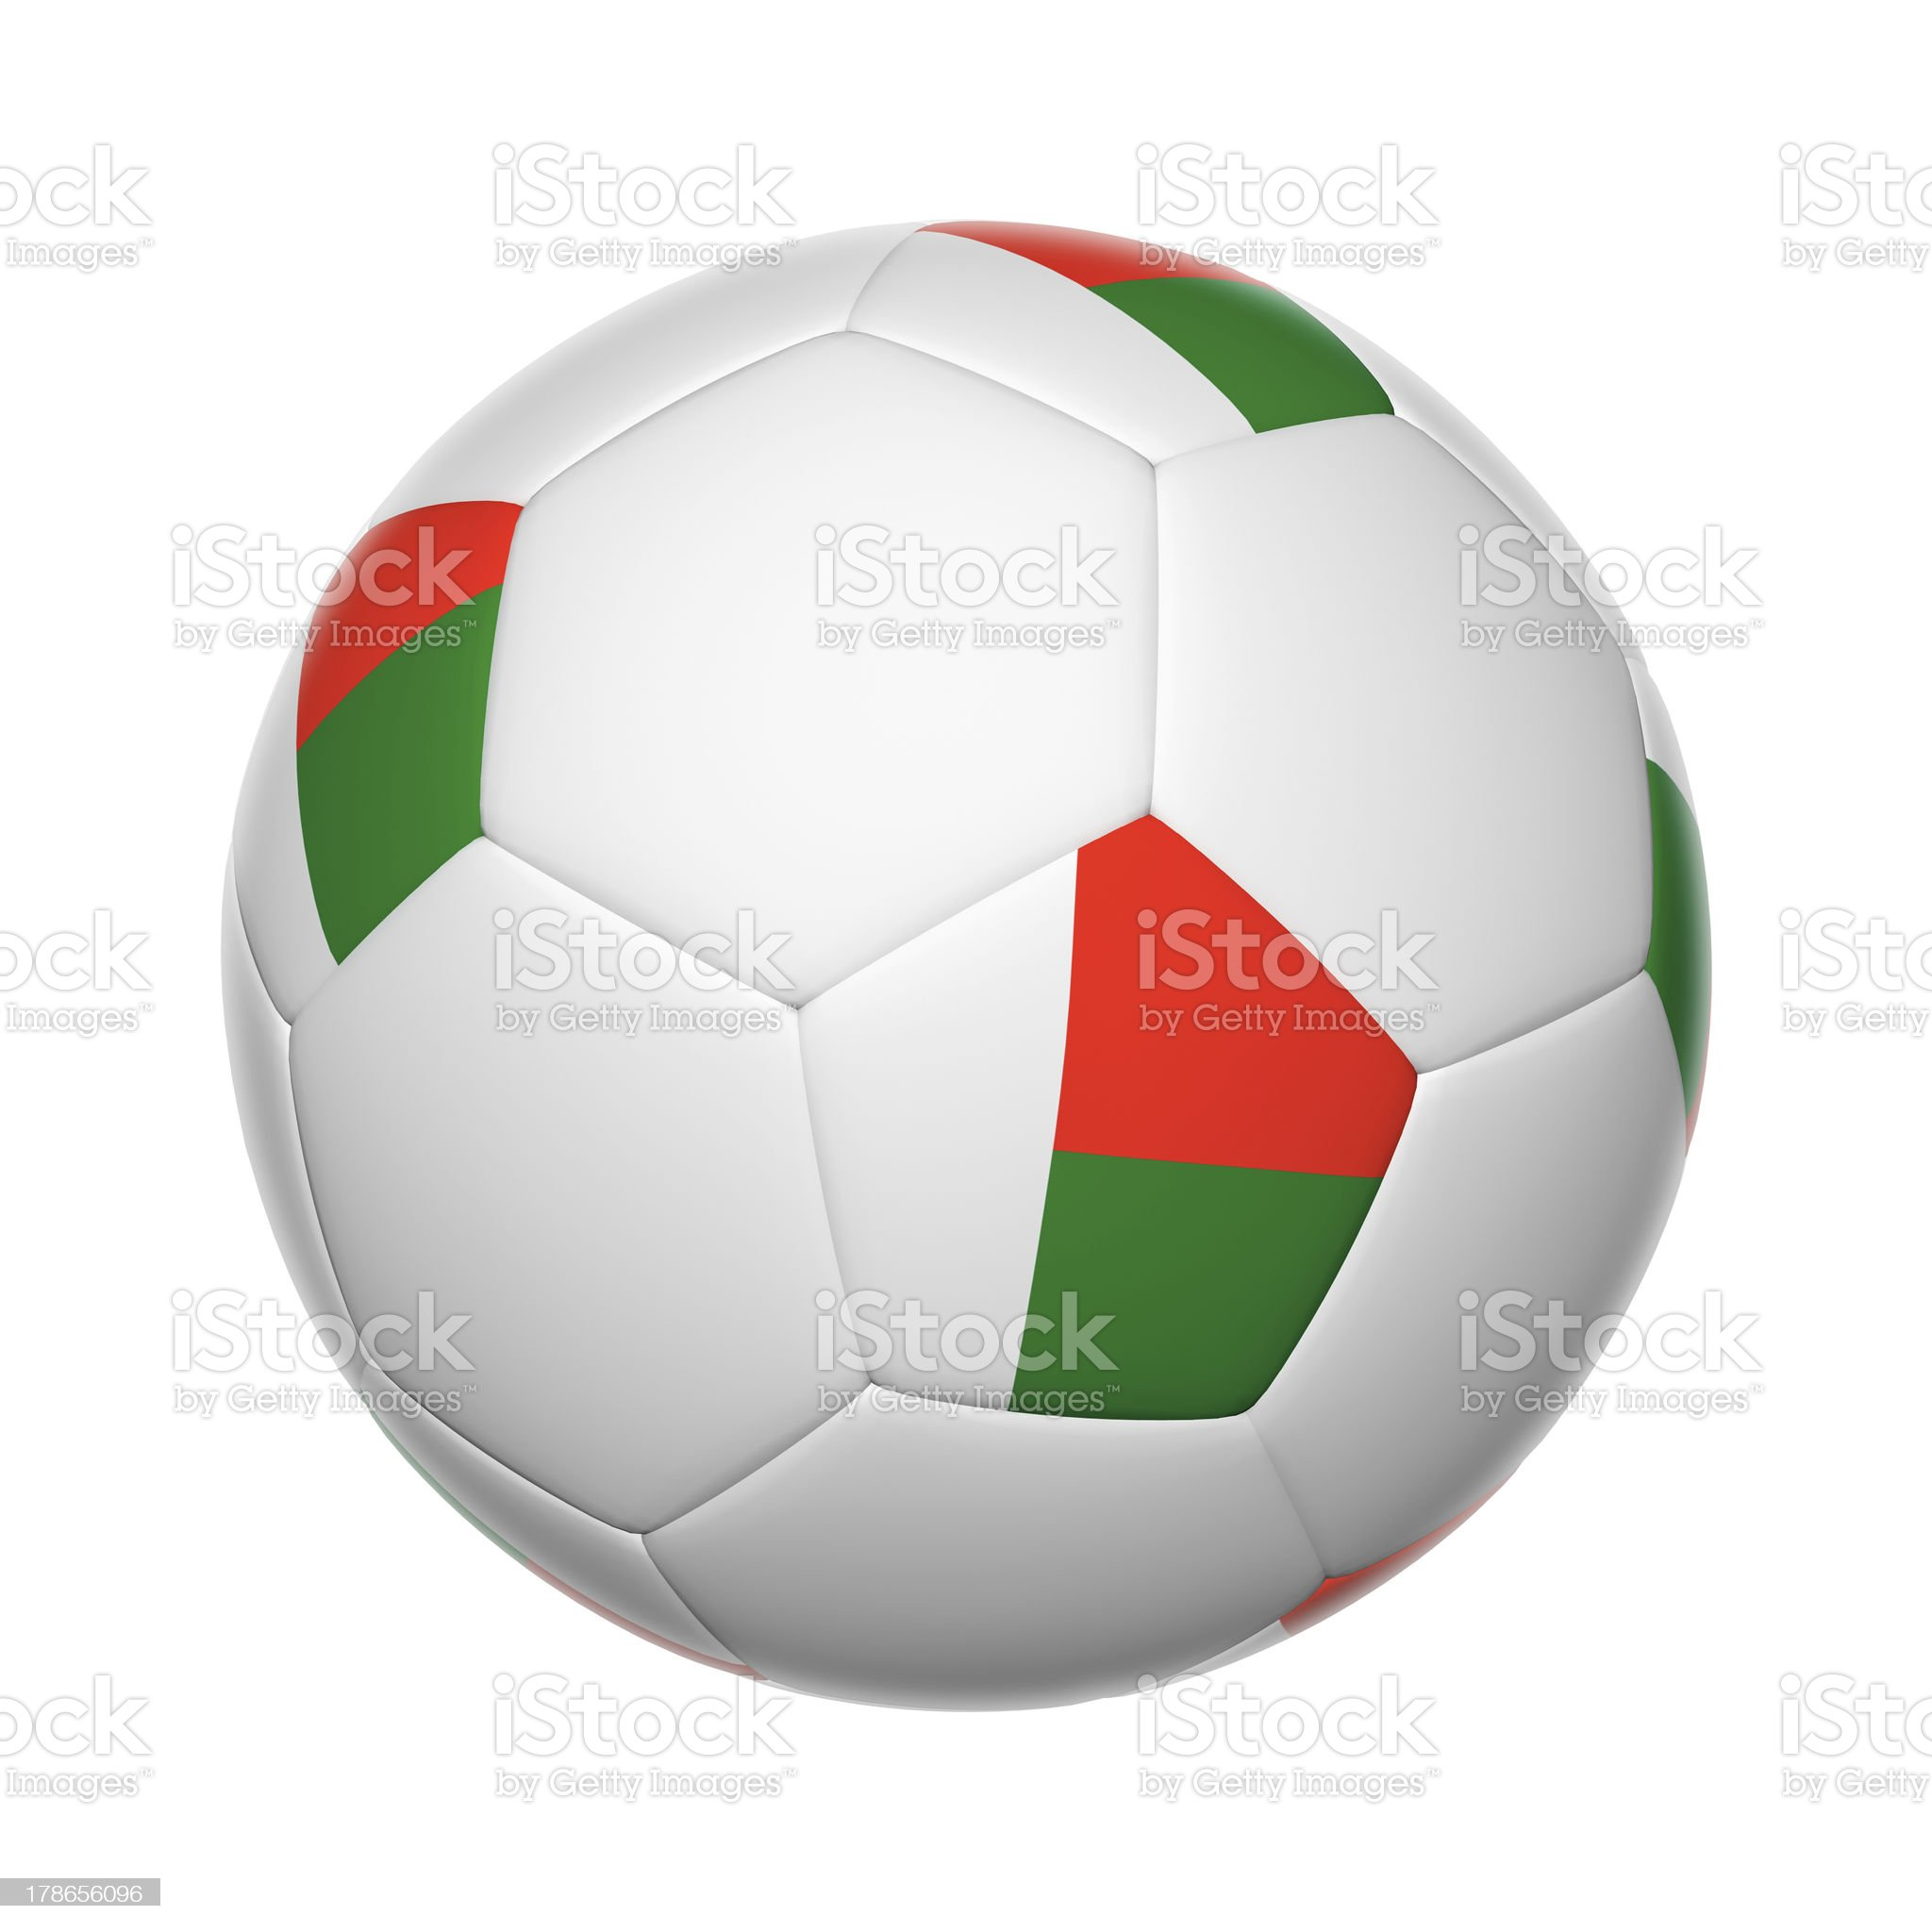 Madagascar soccer ball royalty-free stock photo